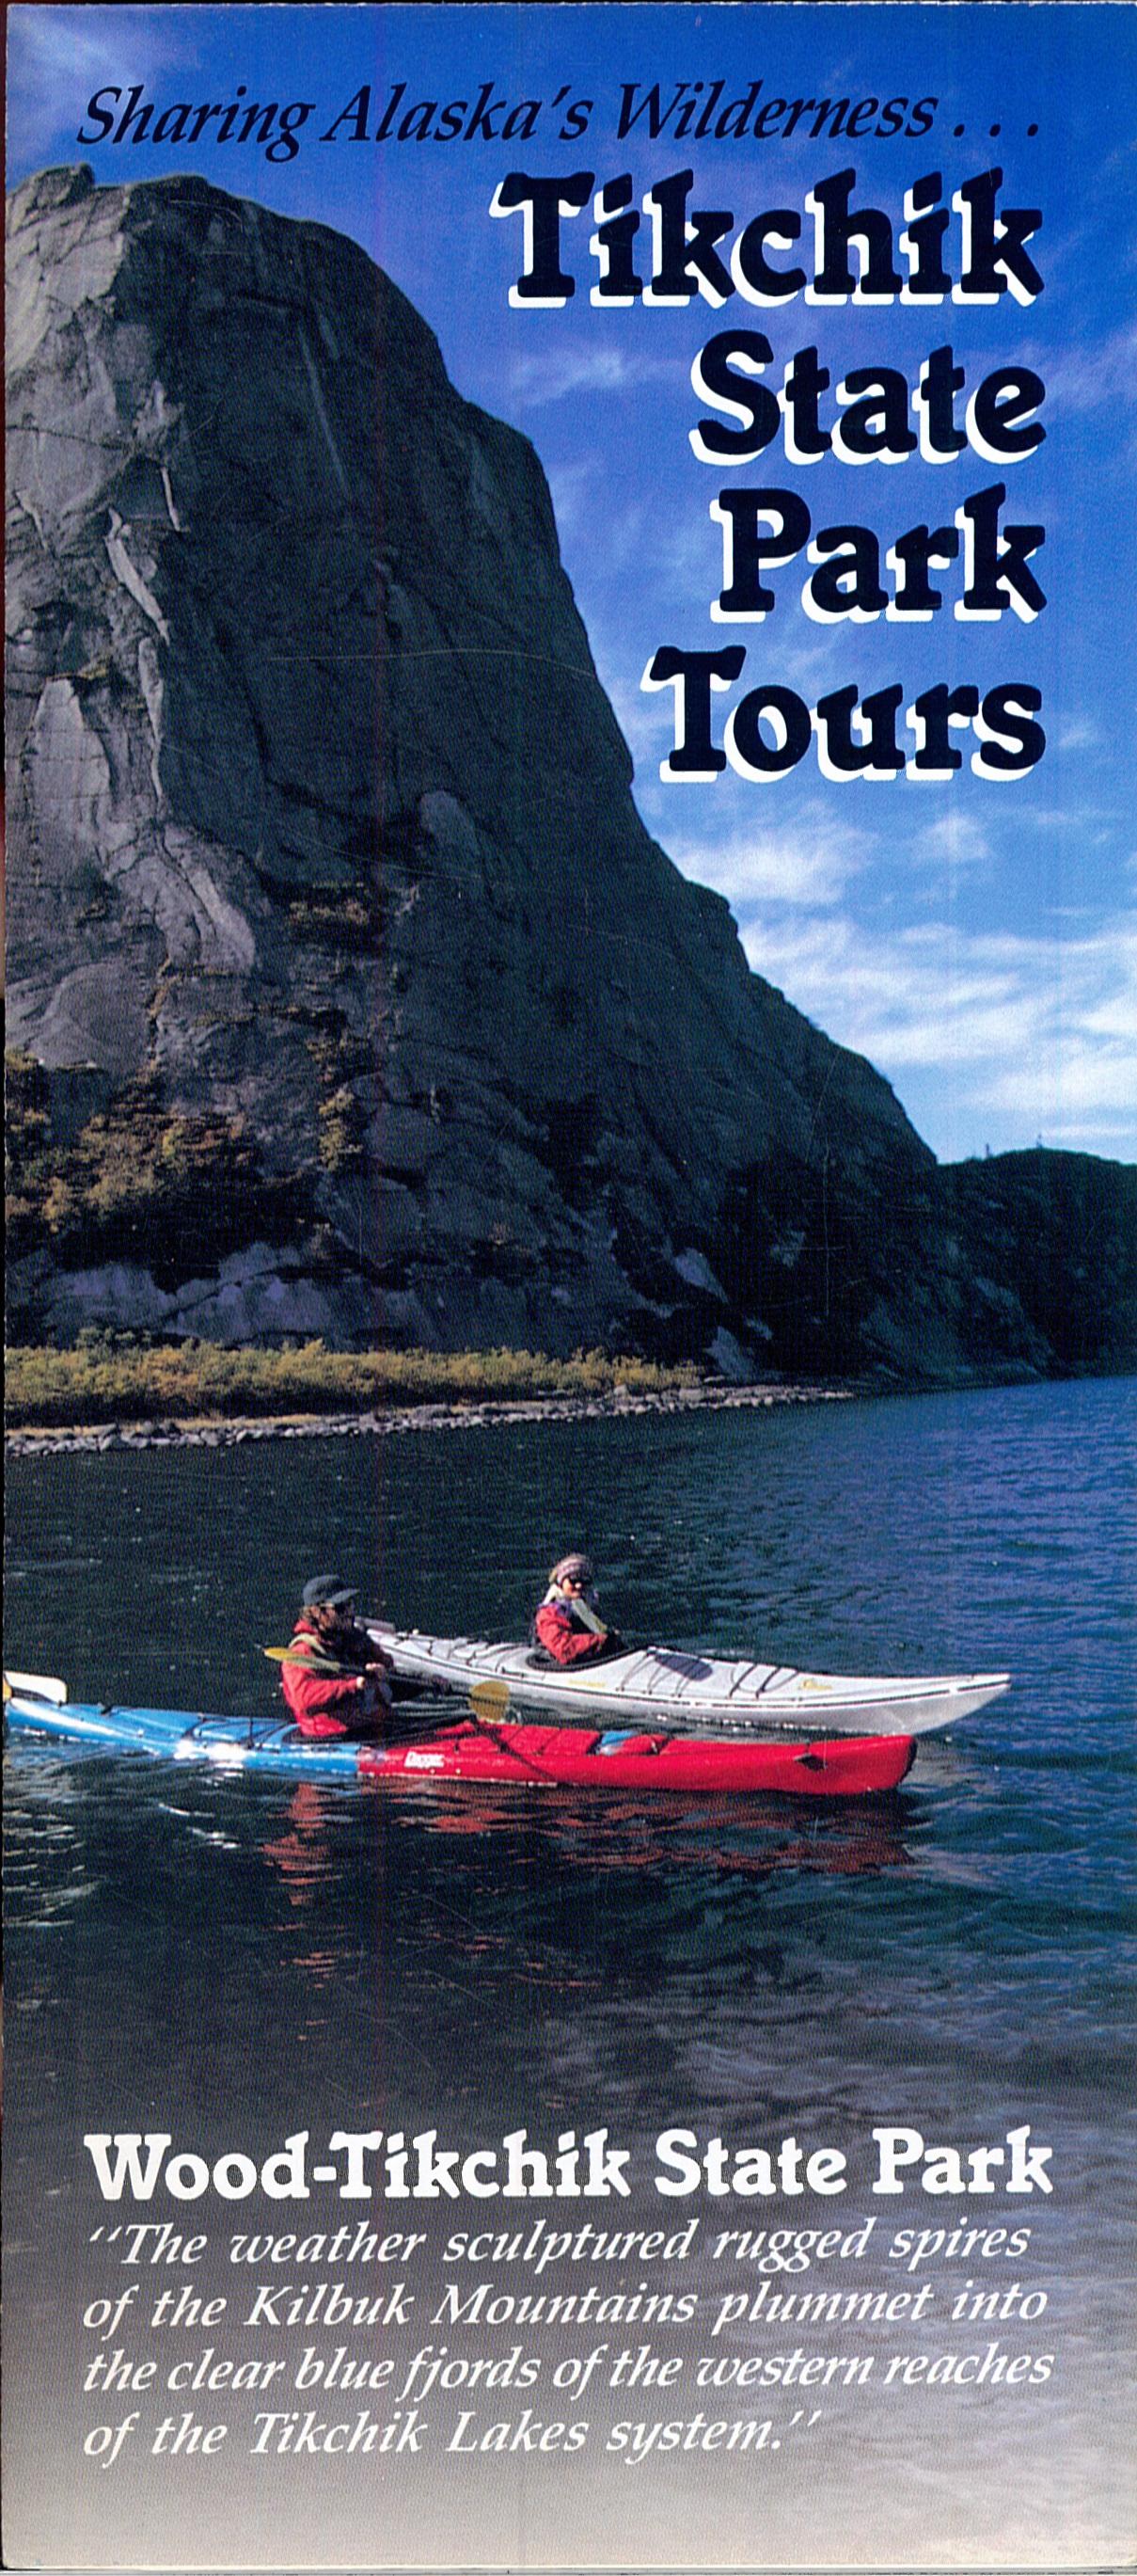 Portada del folleto turístico del Tikchik Sate Parks Tours (Alaska): The «jewel» of Alaska's State Parks.